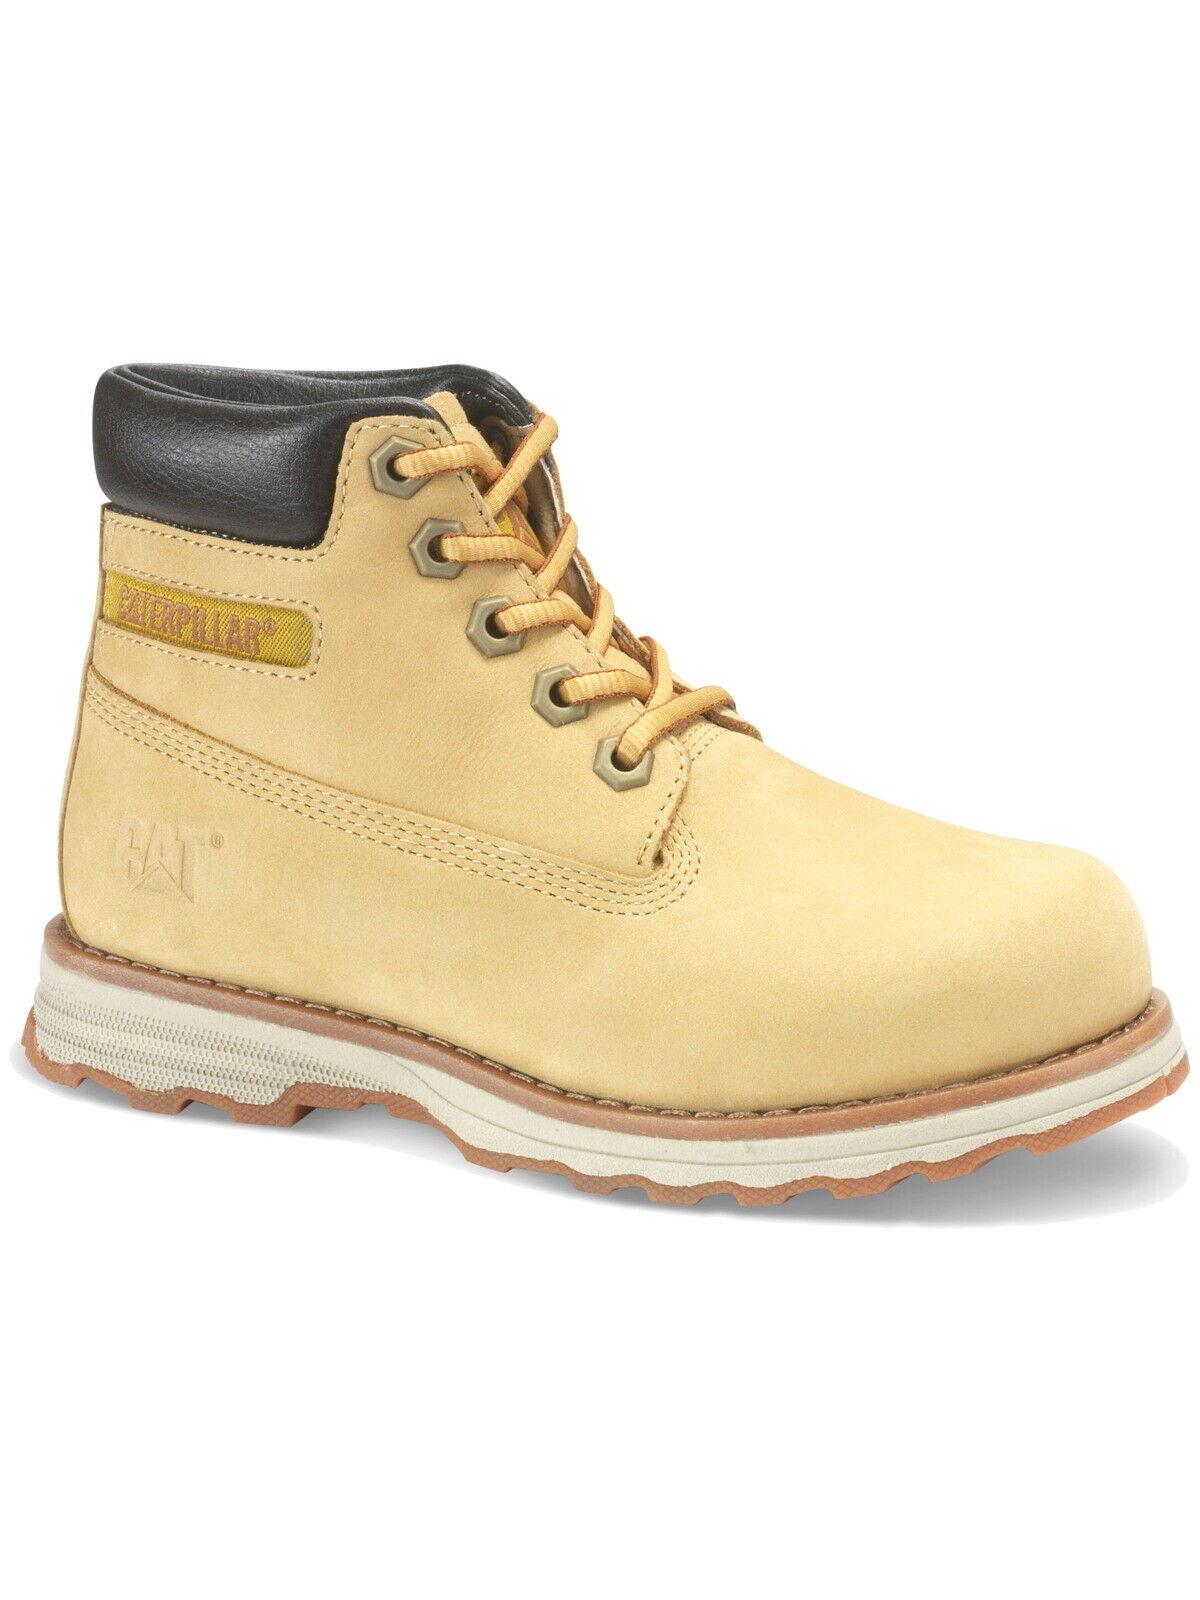 Caterpillar Kinder halbhoch schnür-Schuhe Kurzschaft Stiefel Leder Boots Outdoor